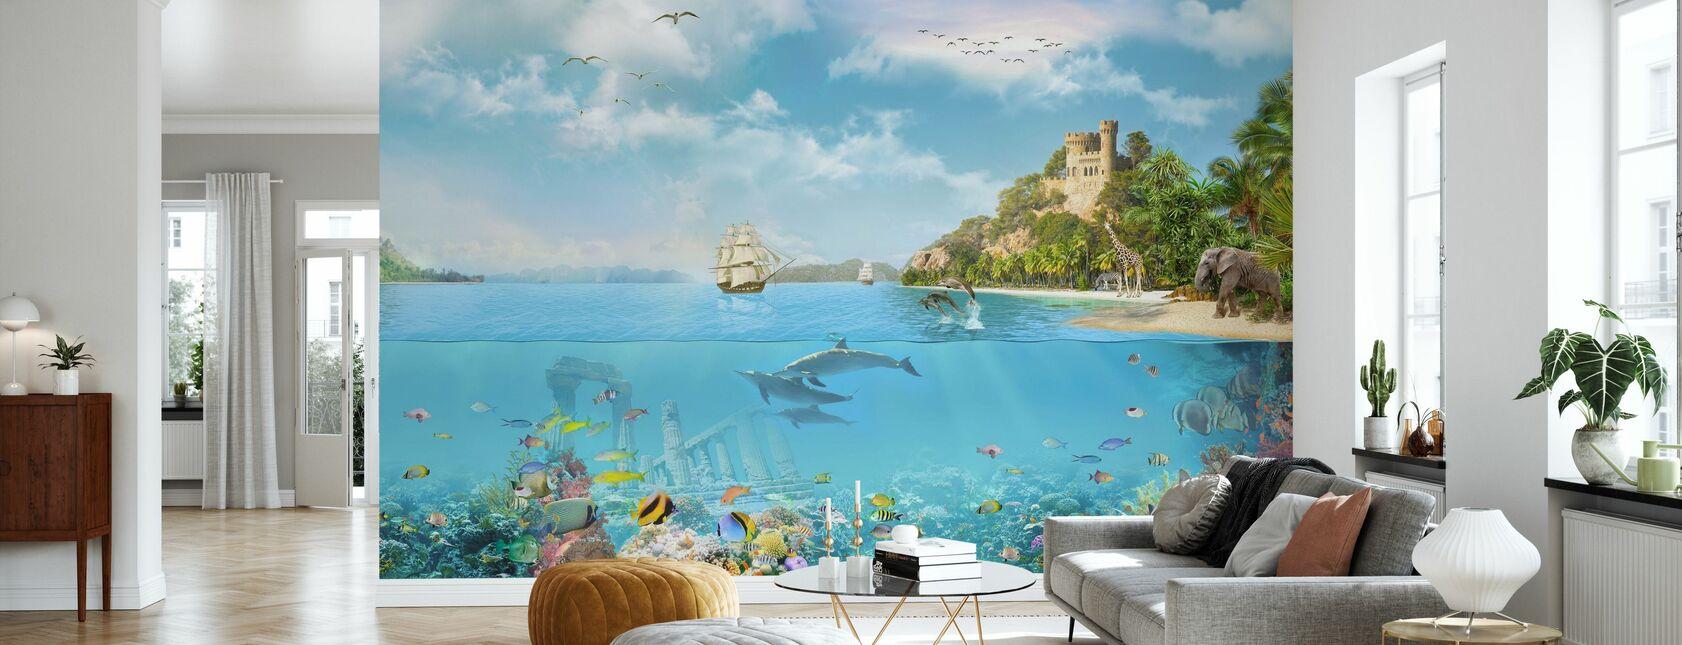 Navy Paradise - Wallpaper - Living Room